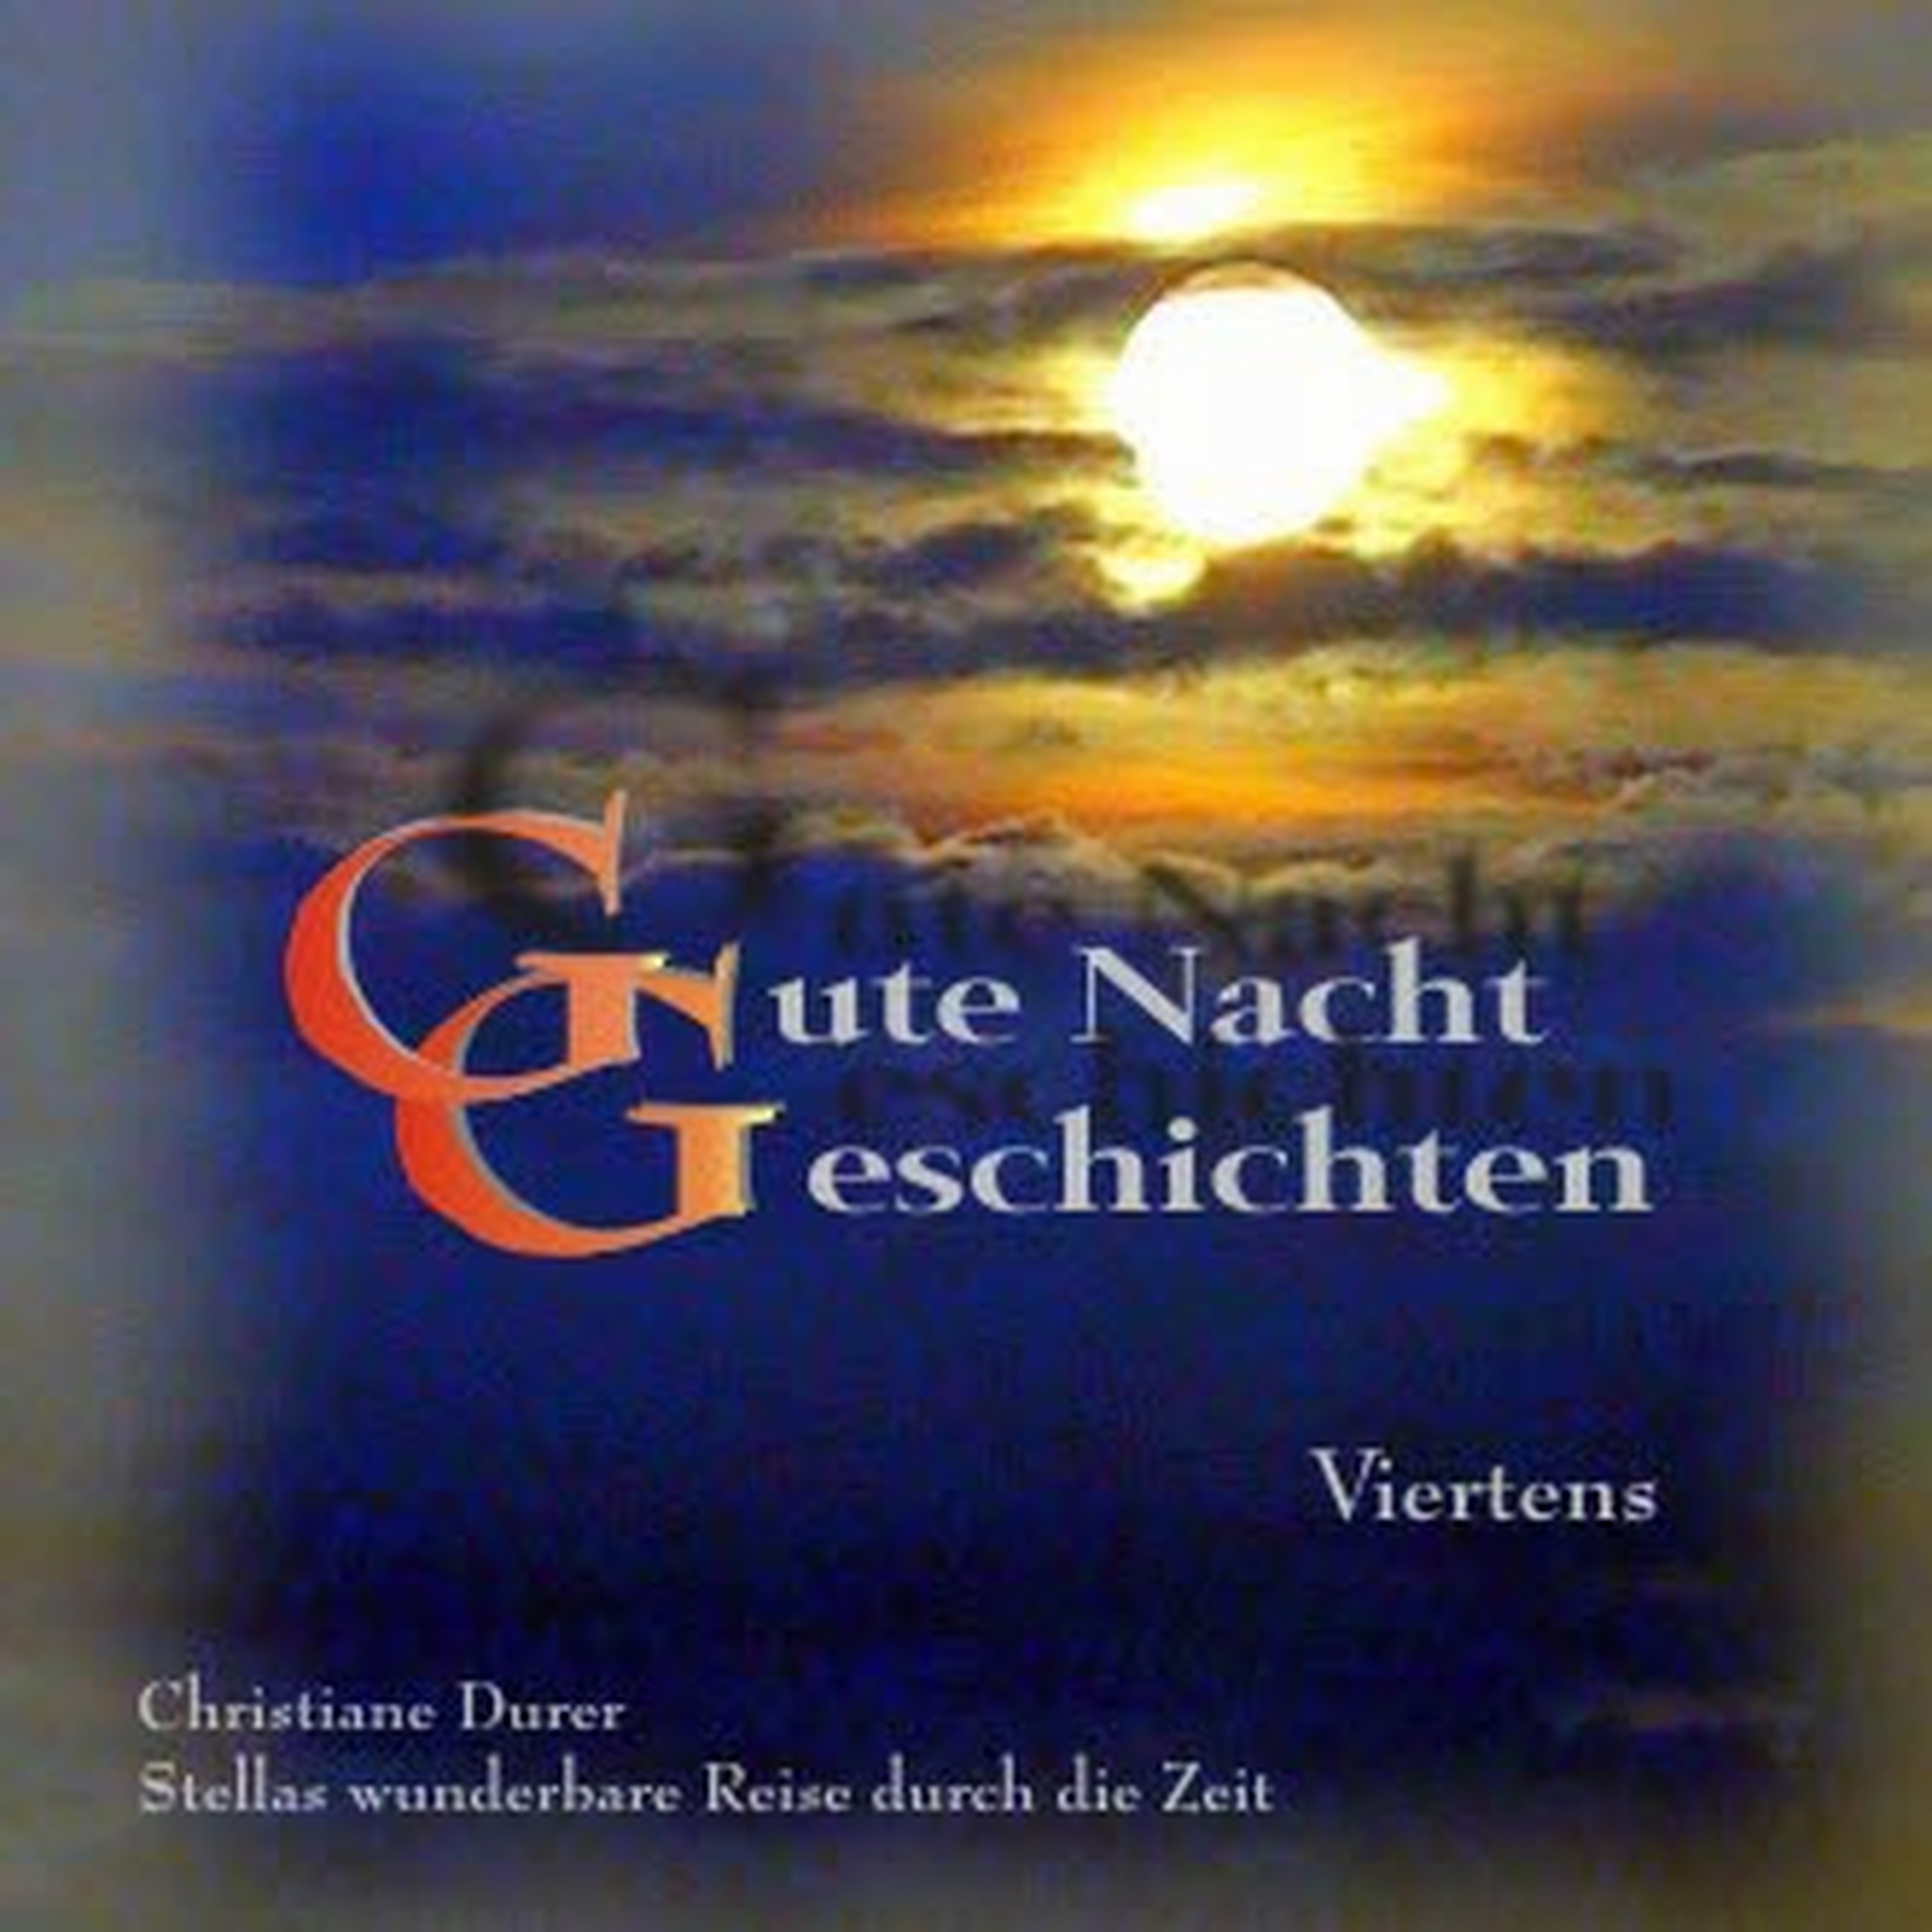 Gute-Nacht-Geschichten-4